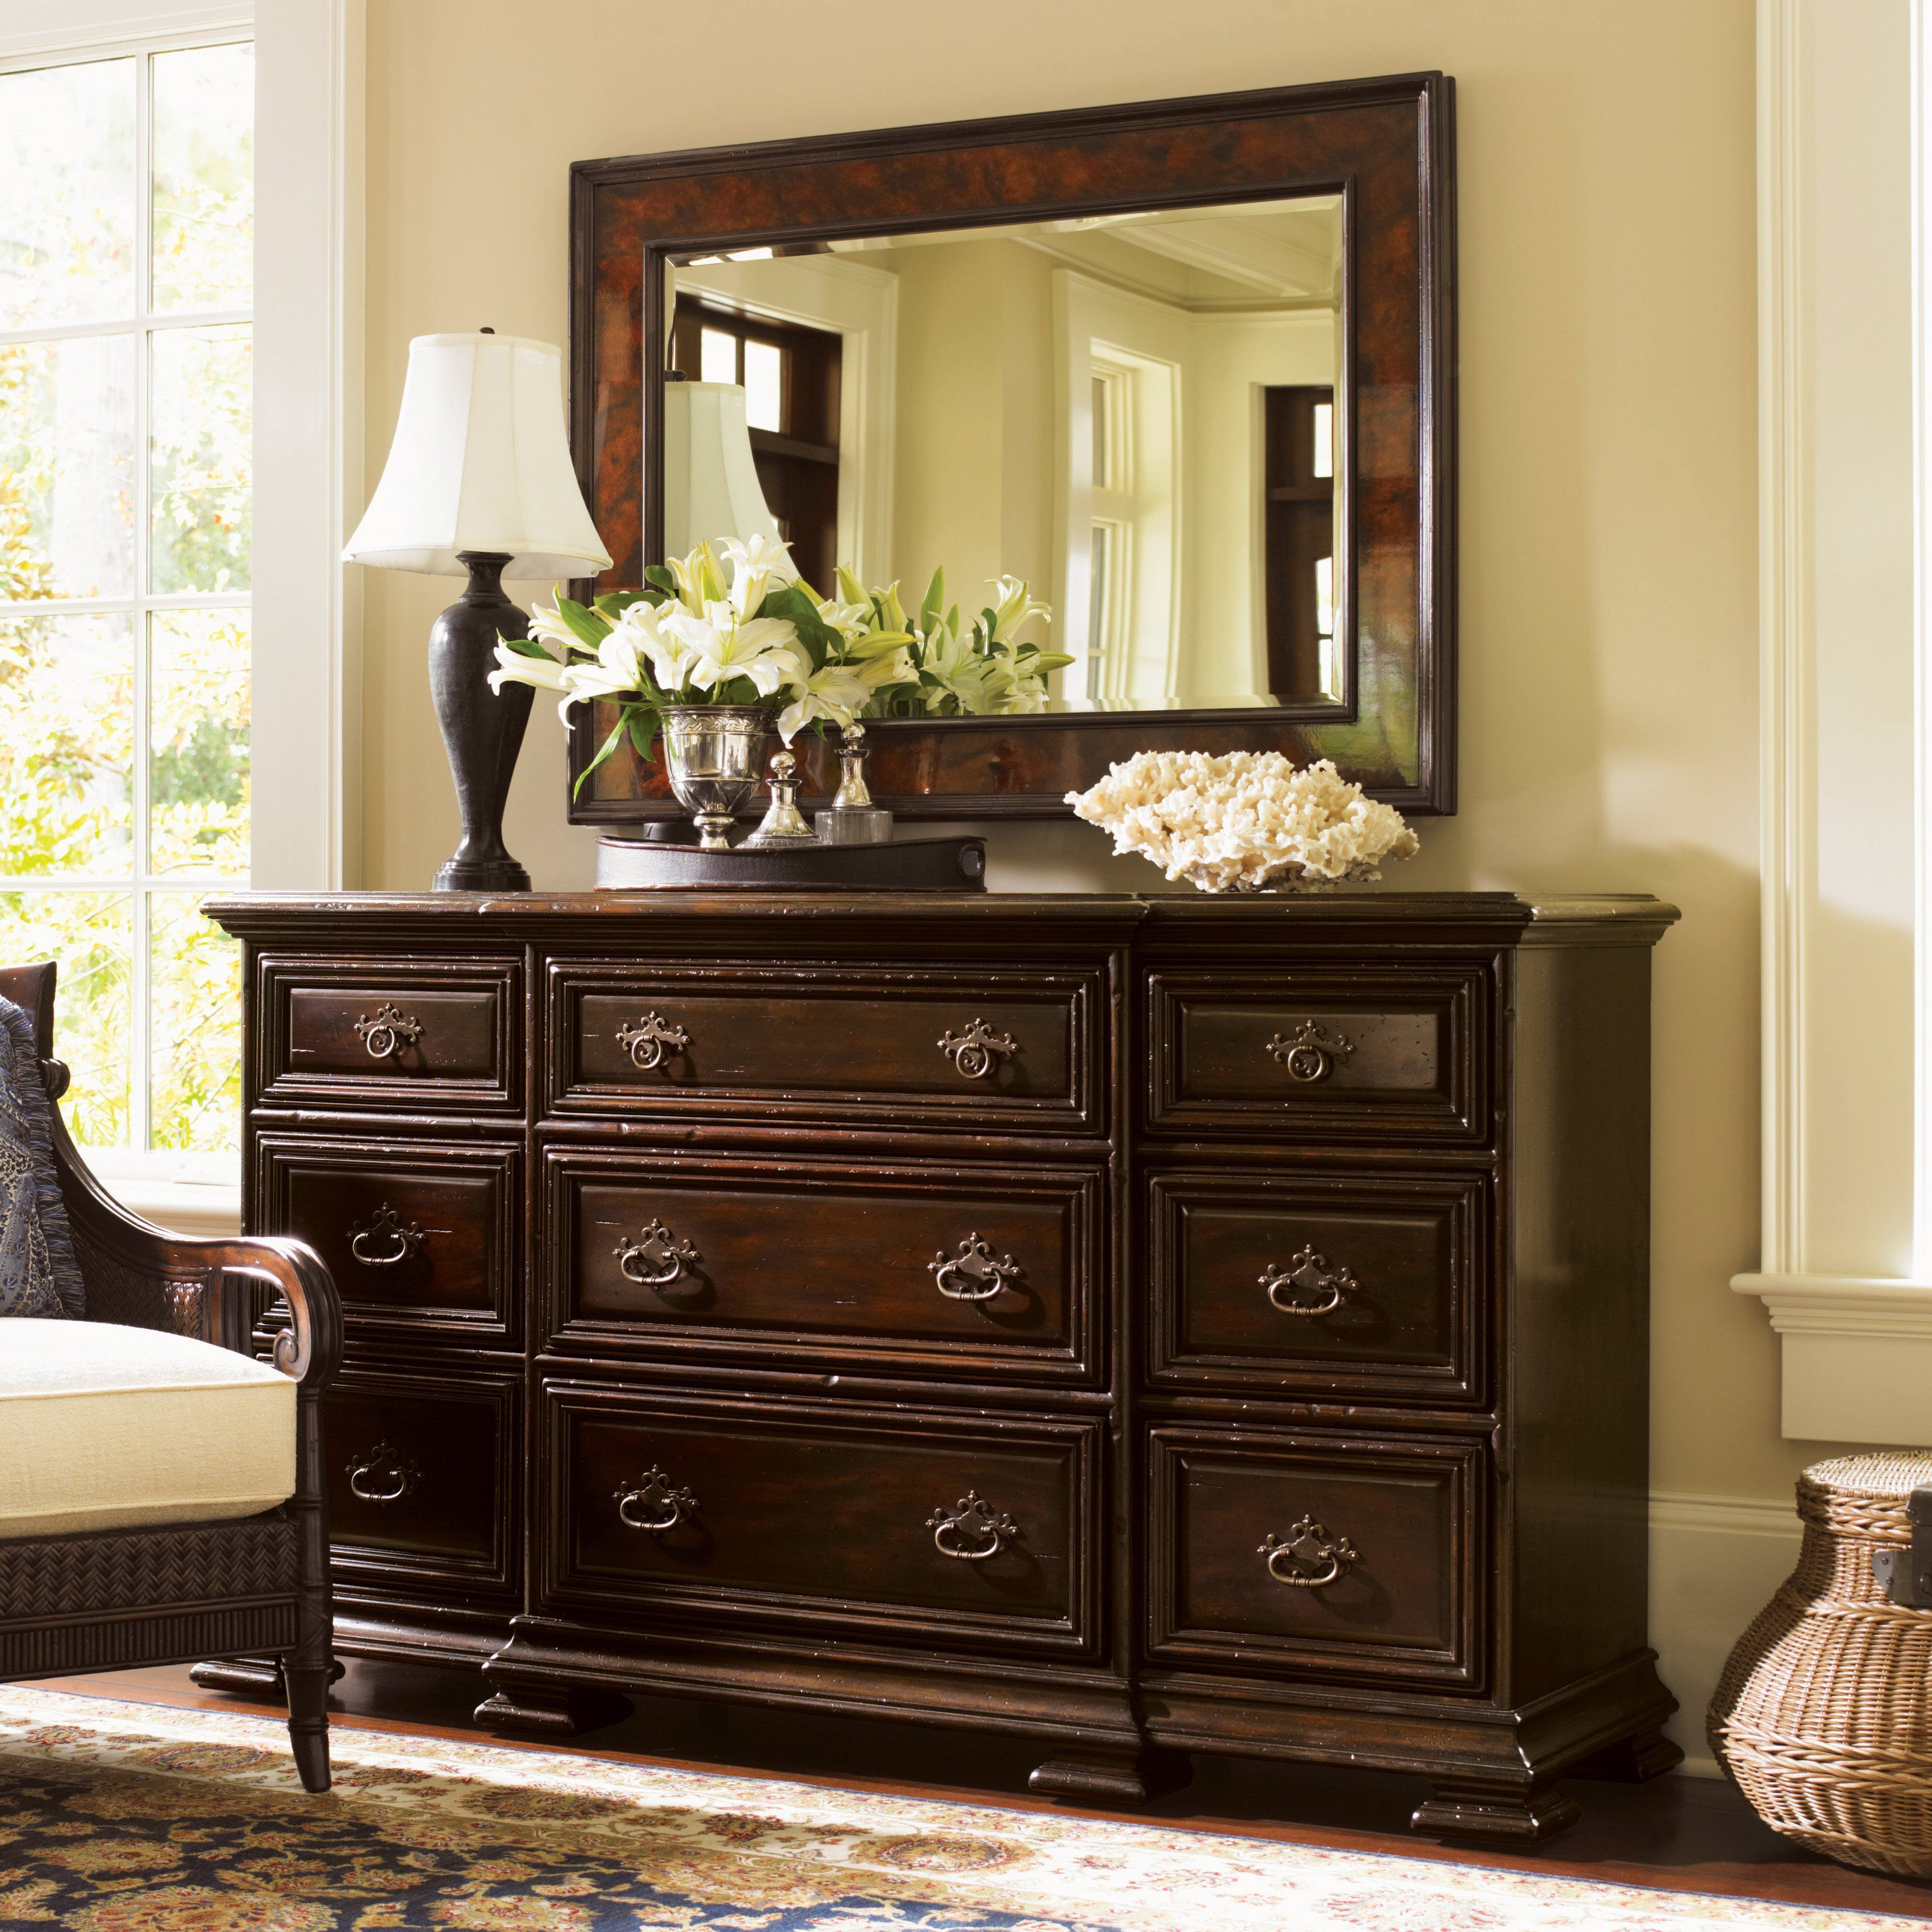 Lexington Home Brands Bexley Triple Dresser from